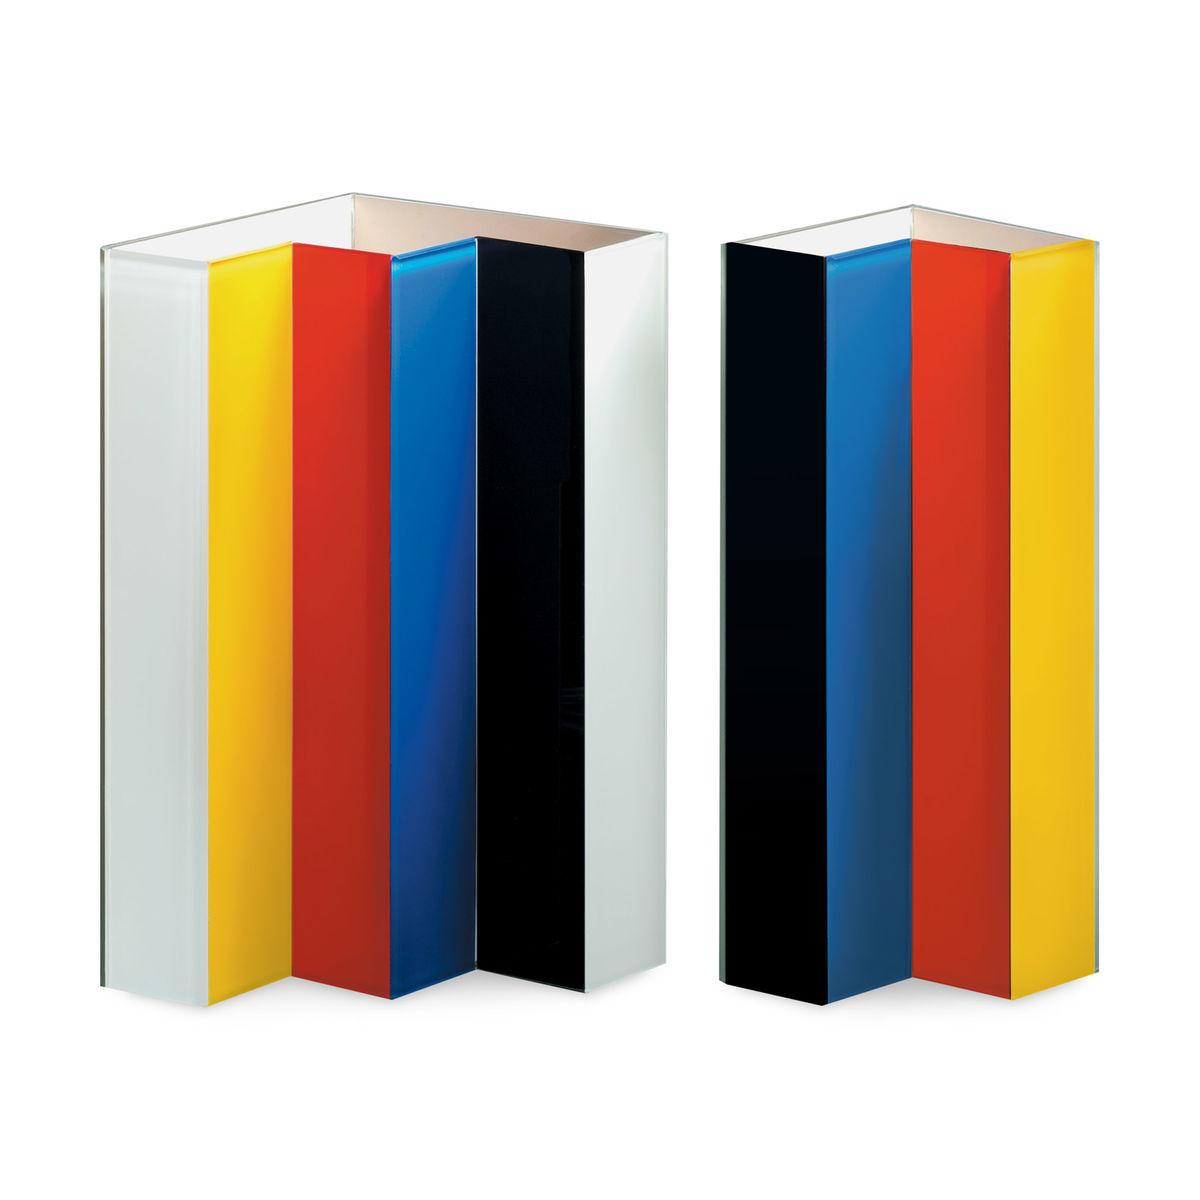 「Line up ベース」    販売予定価格: 12,960円 (2017年10月27日時点 税込価格)